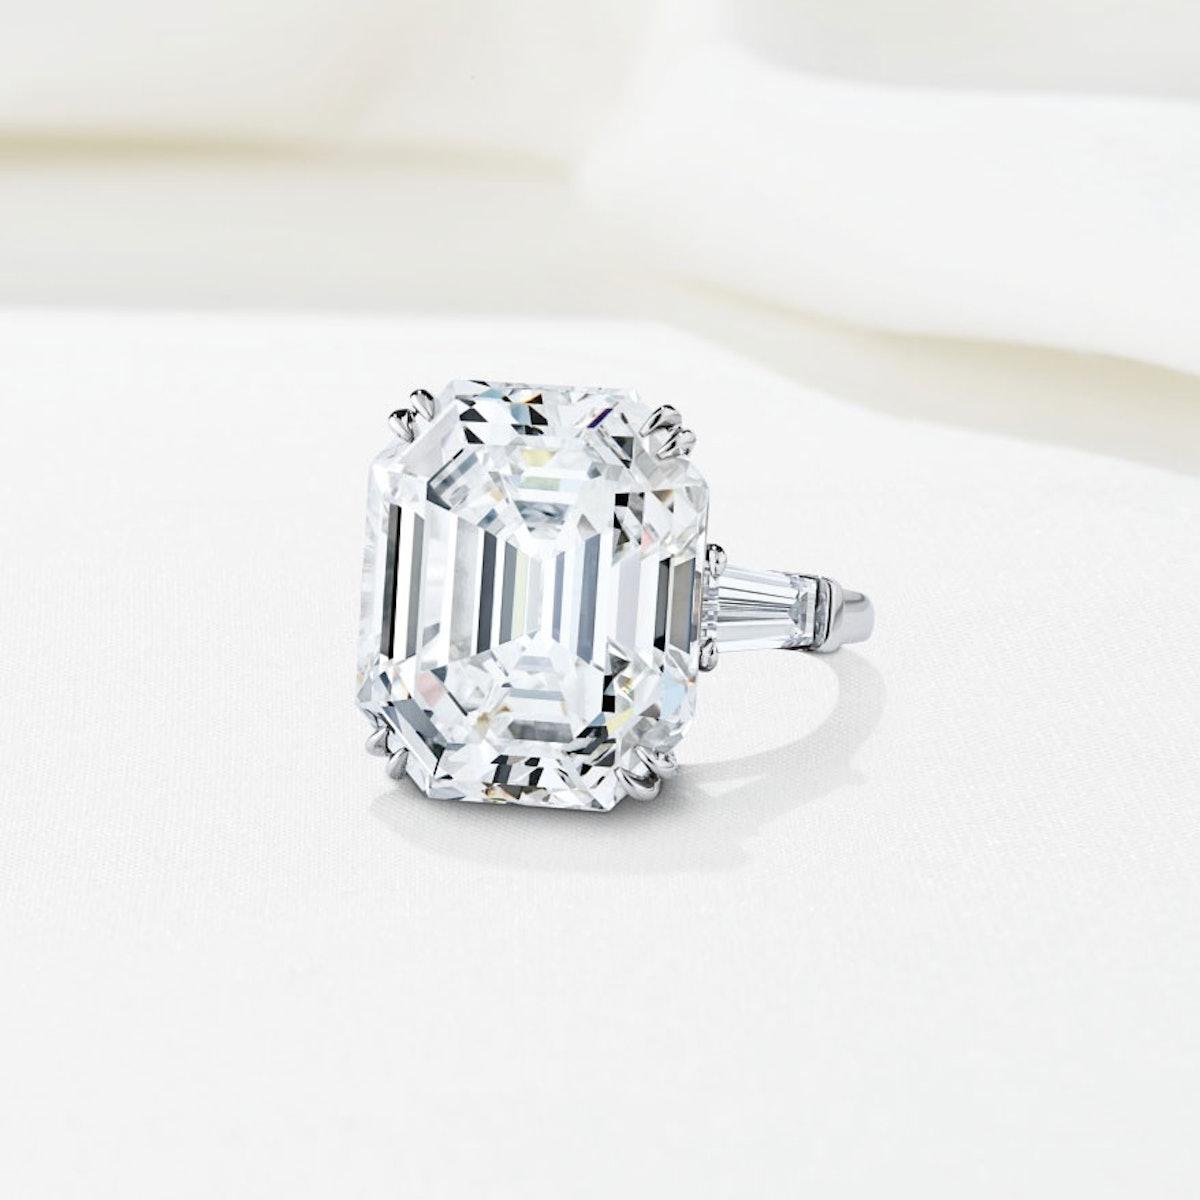 Harry-Winston-20.64-Carat-Emerald-Cut-Diamond-Ring,-Price-Upon-Request,-at-www.harrywinston.com